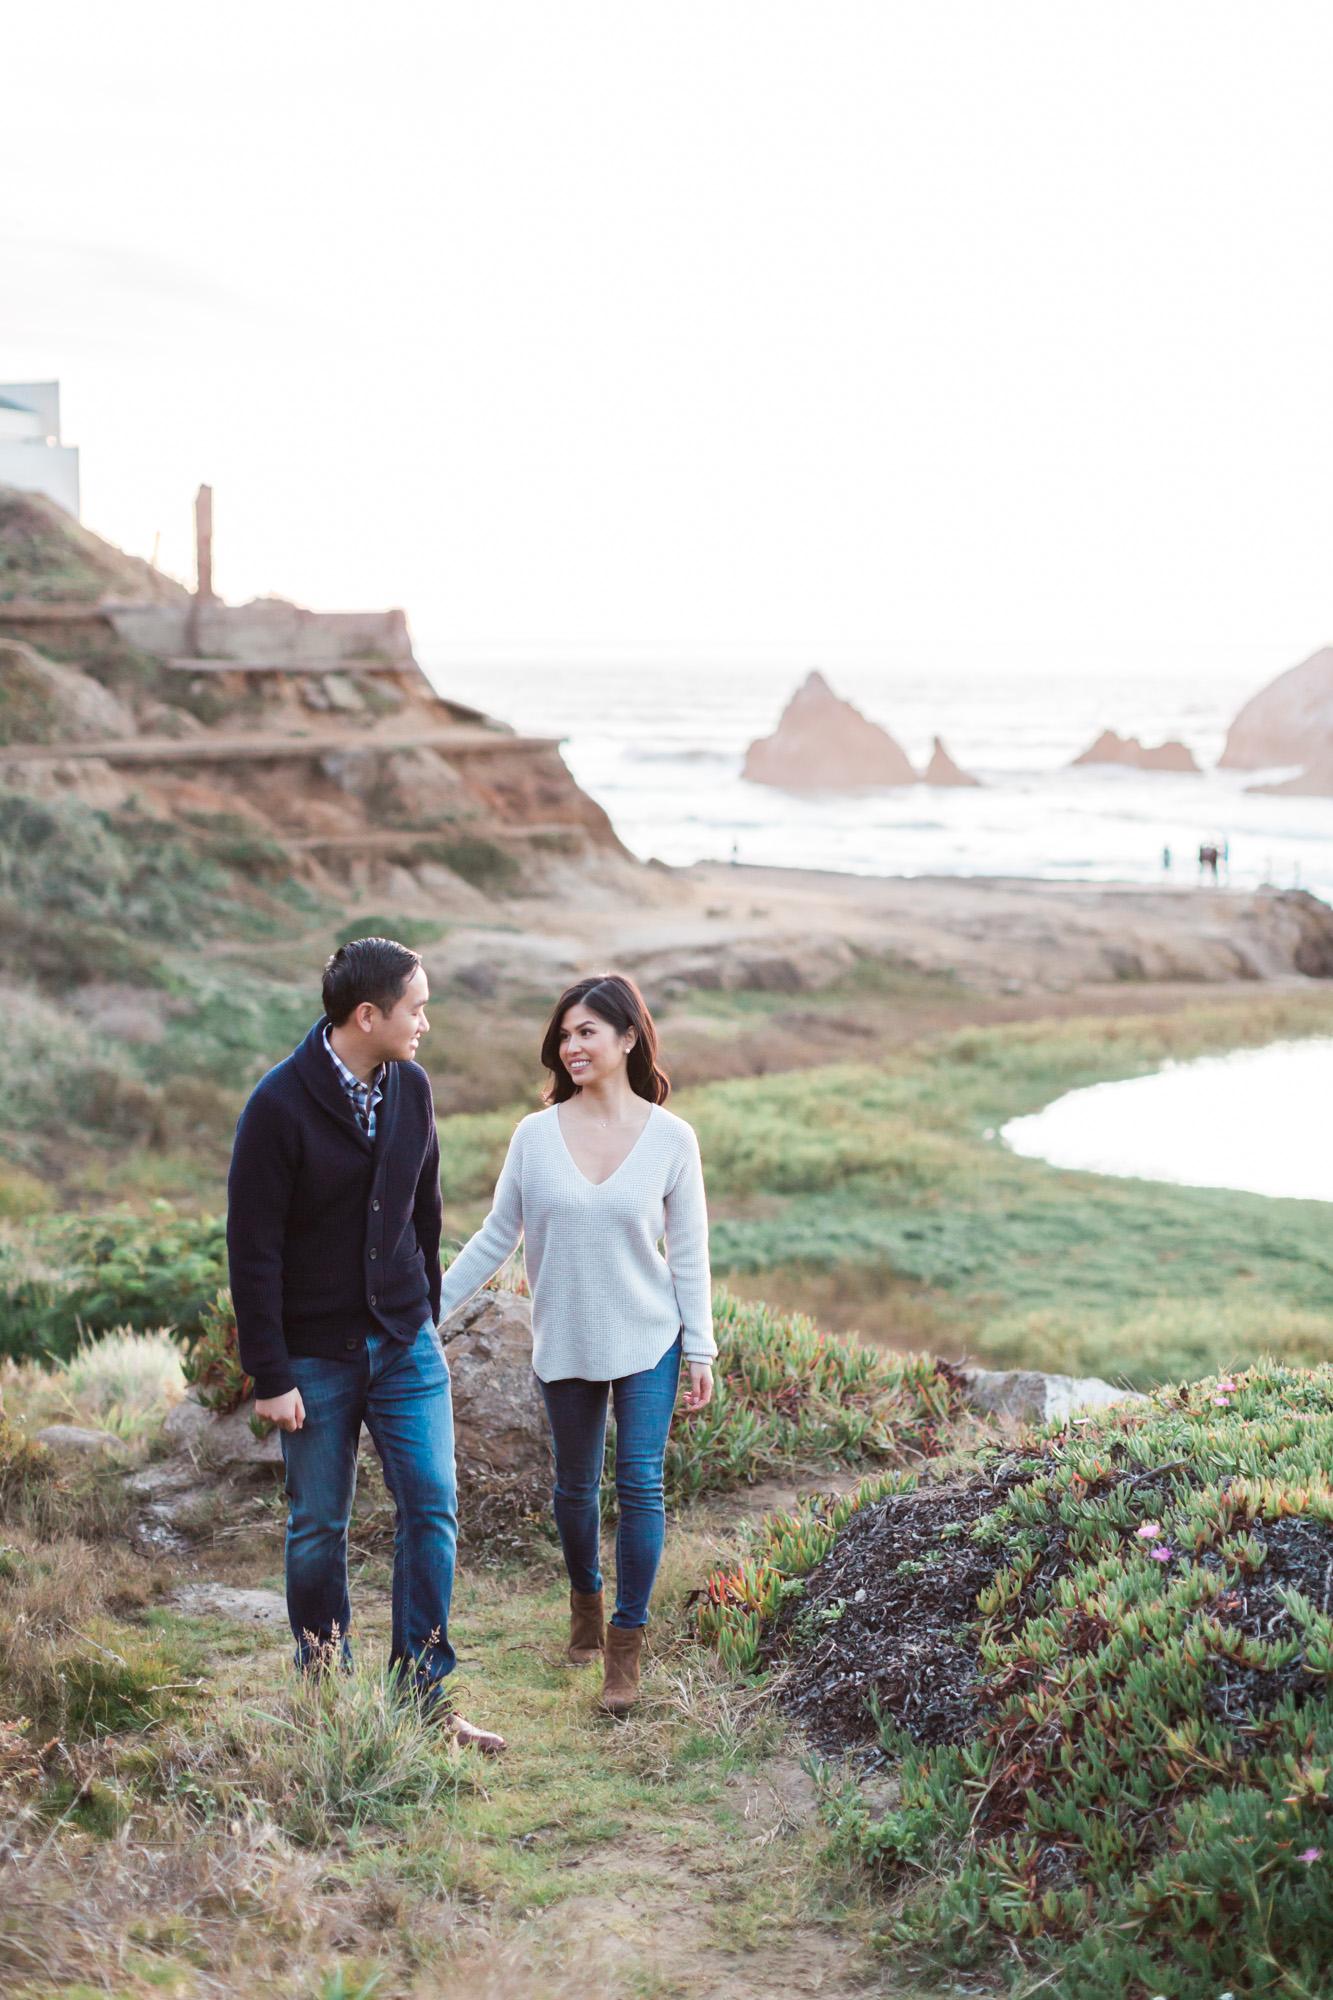 joeewong-jaal-california-san-francisco-engagement-07